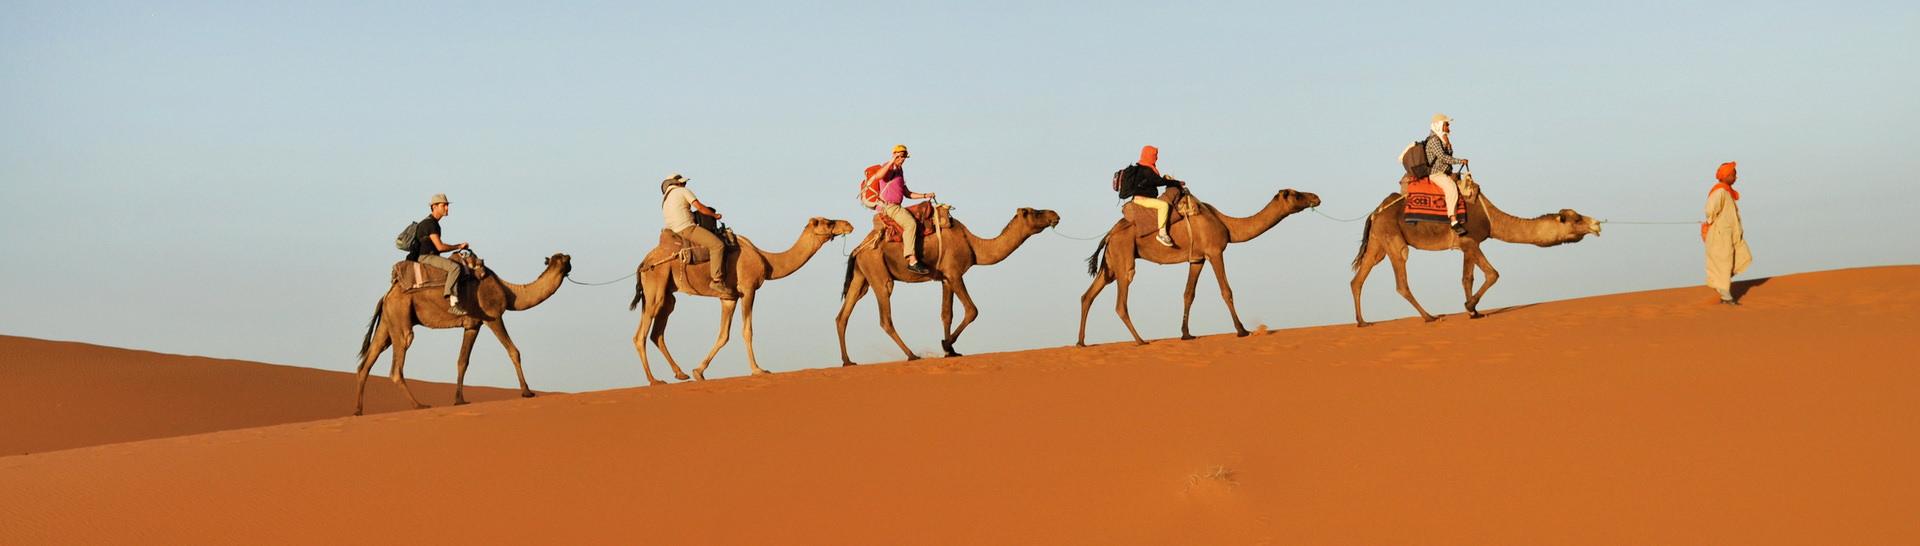 Morocco Caravan in the Sahara